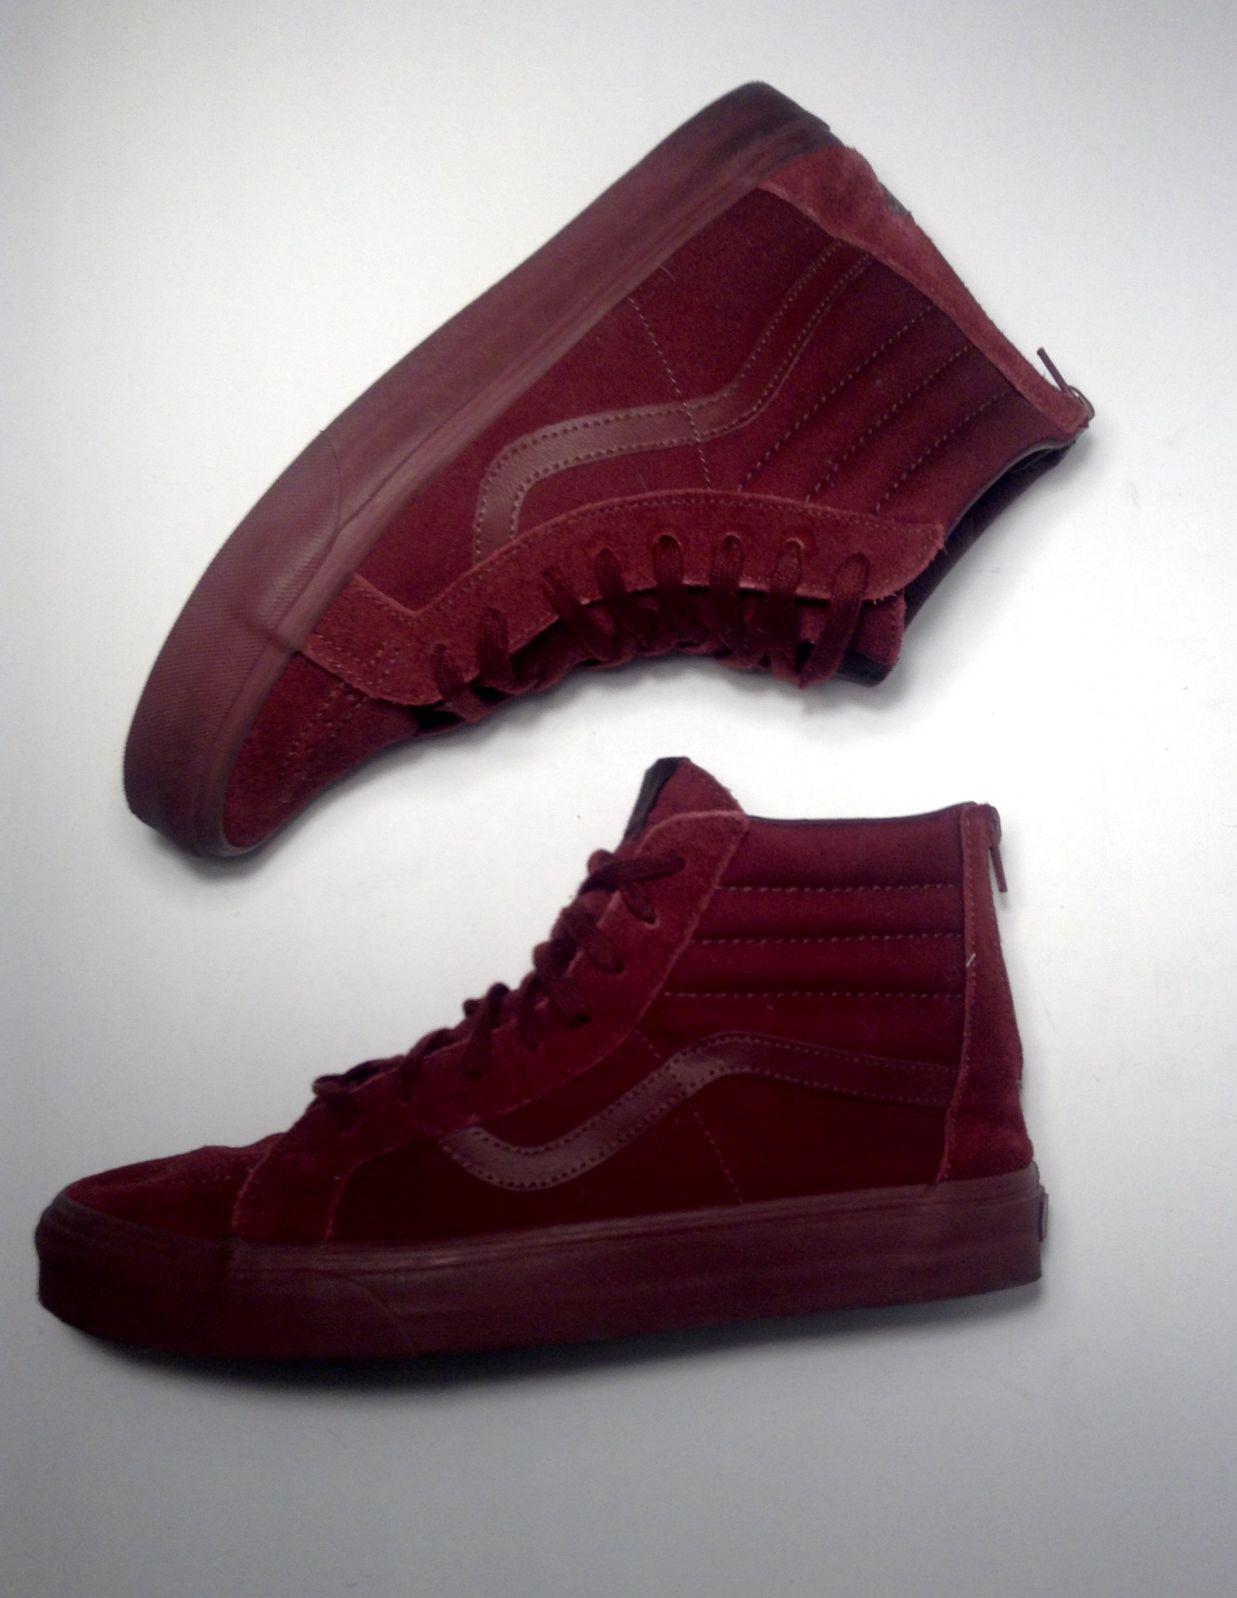 Vans Dark Red High Top Sneakers with